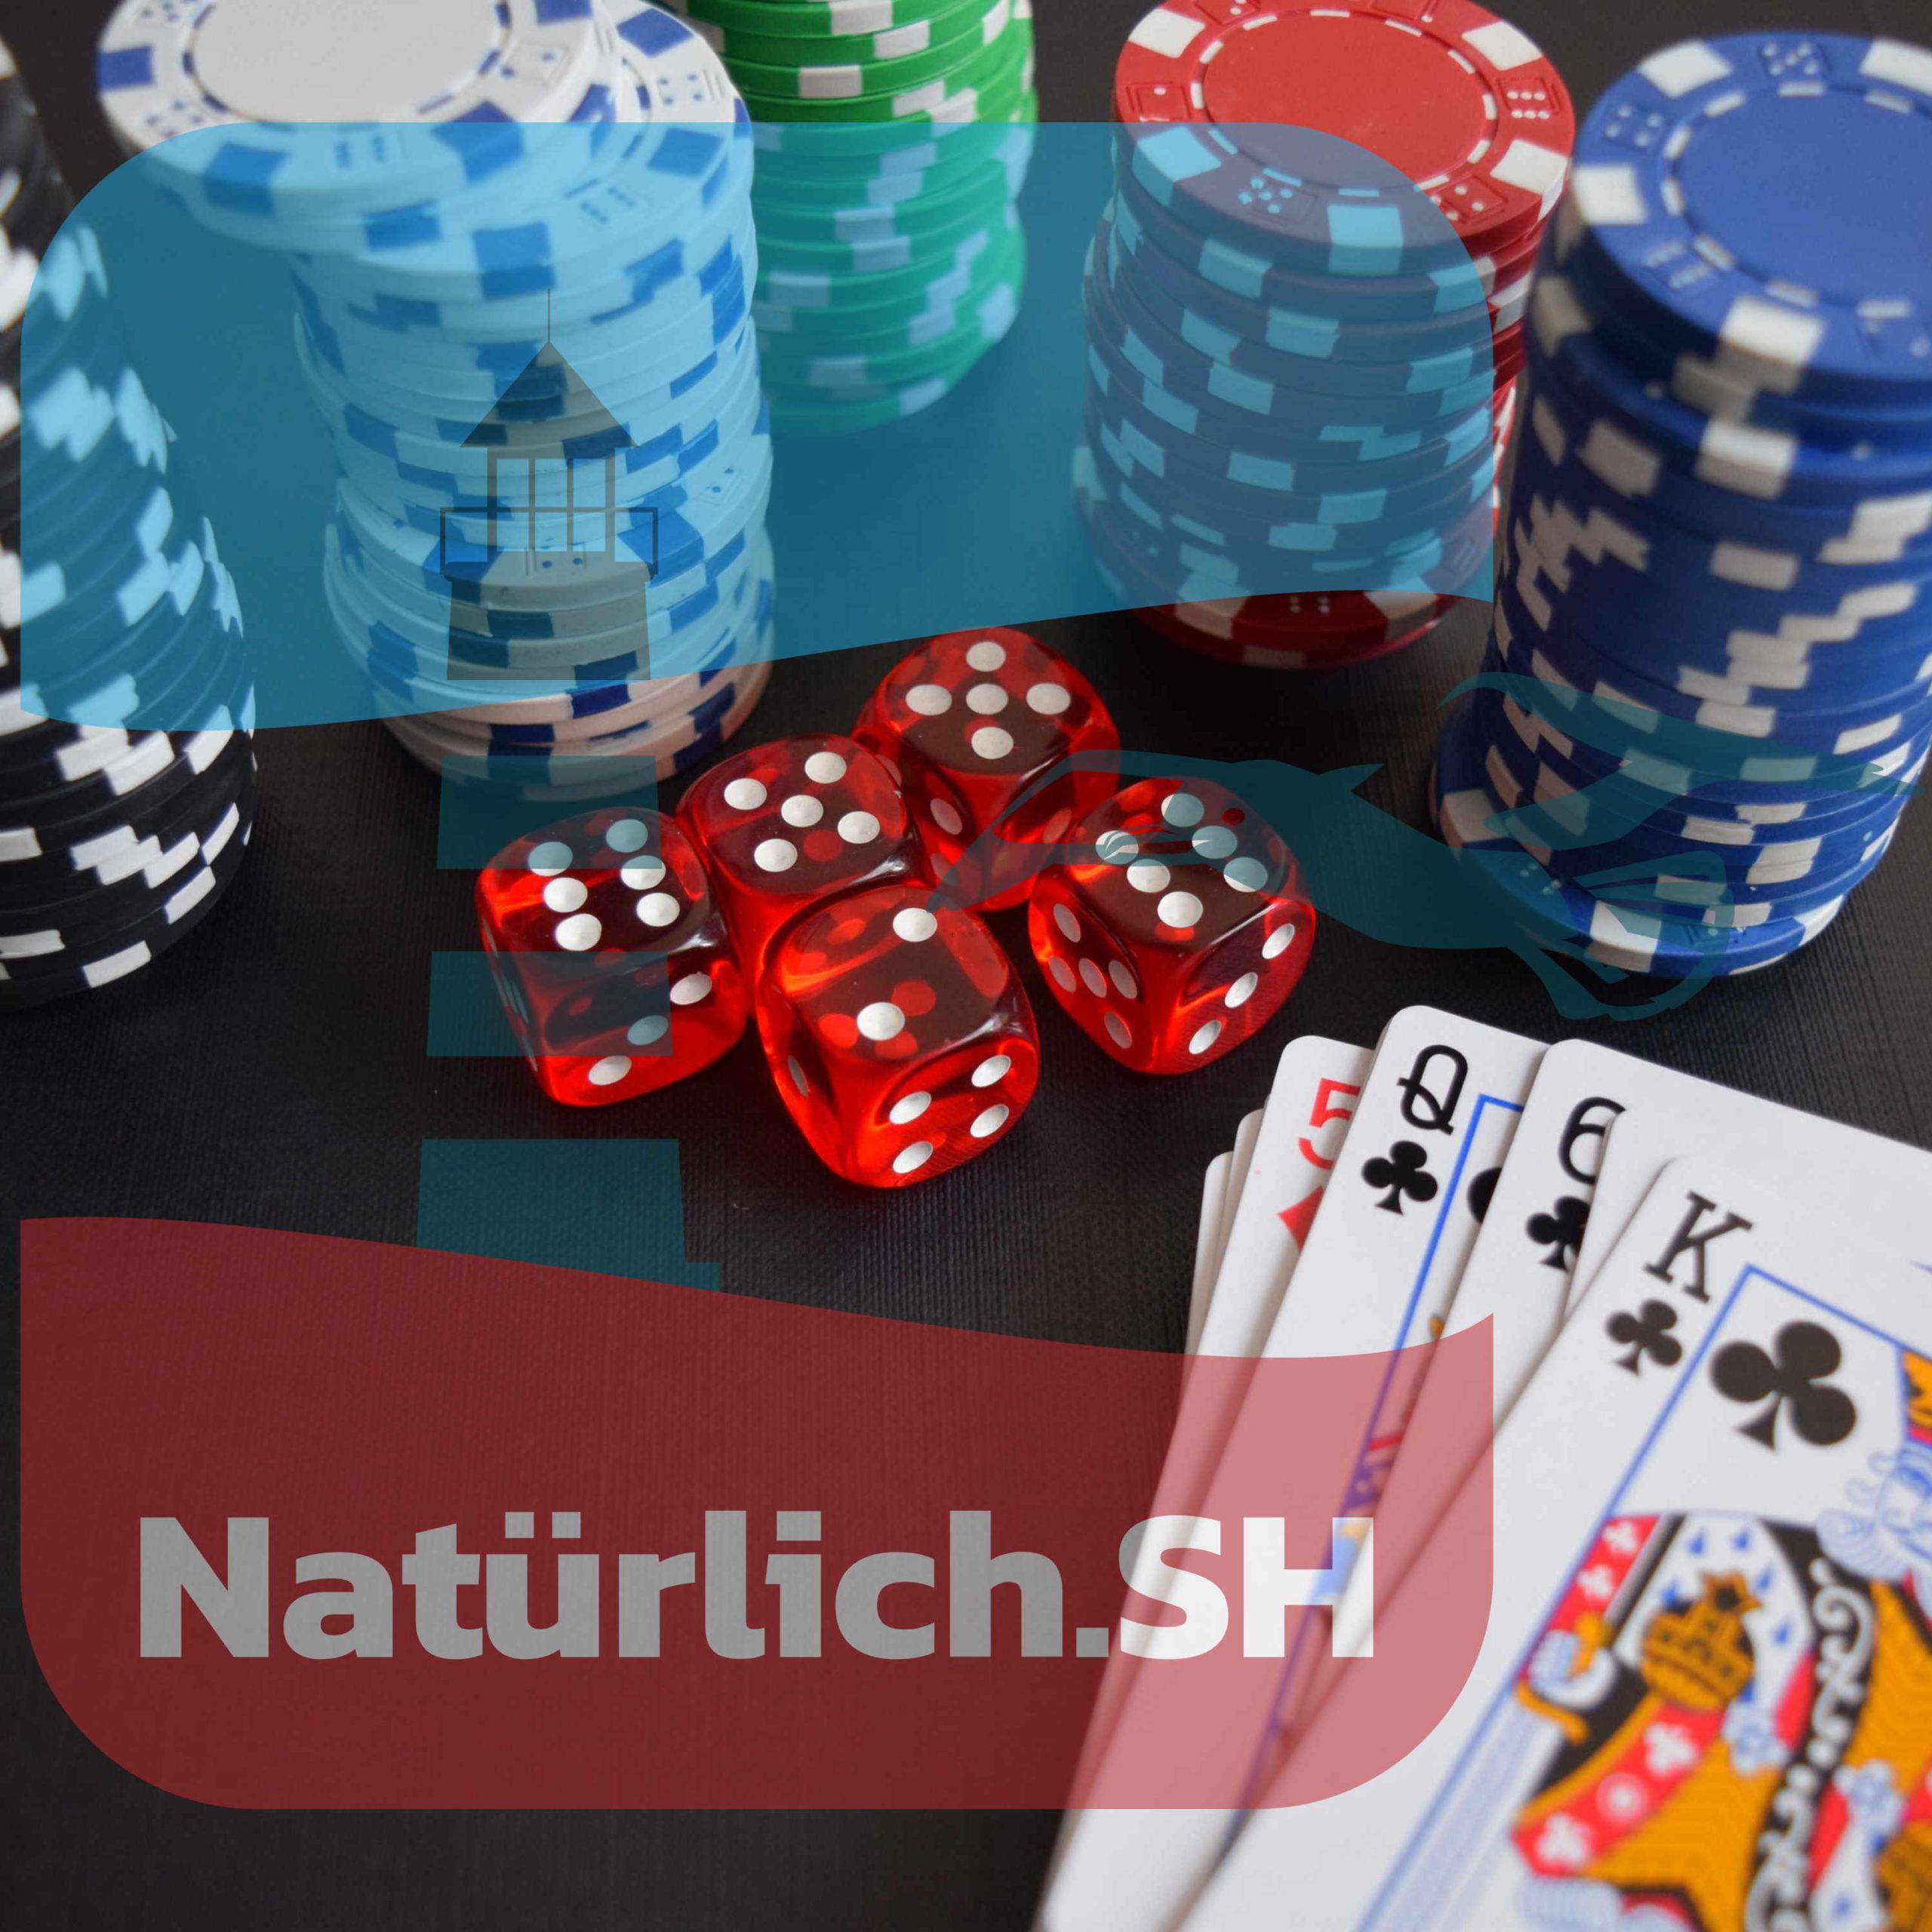 Bonusfolge Glücksspielstaatsvertrag